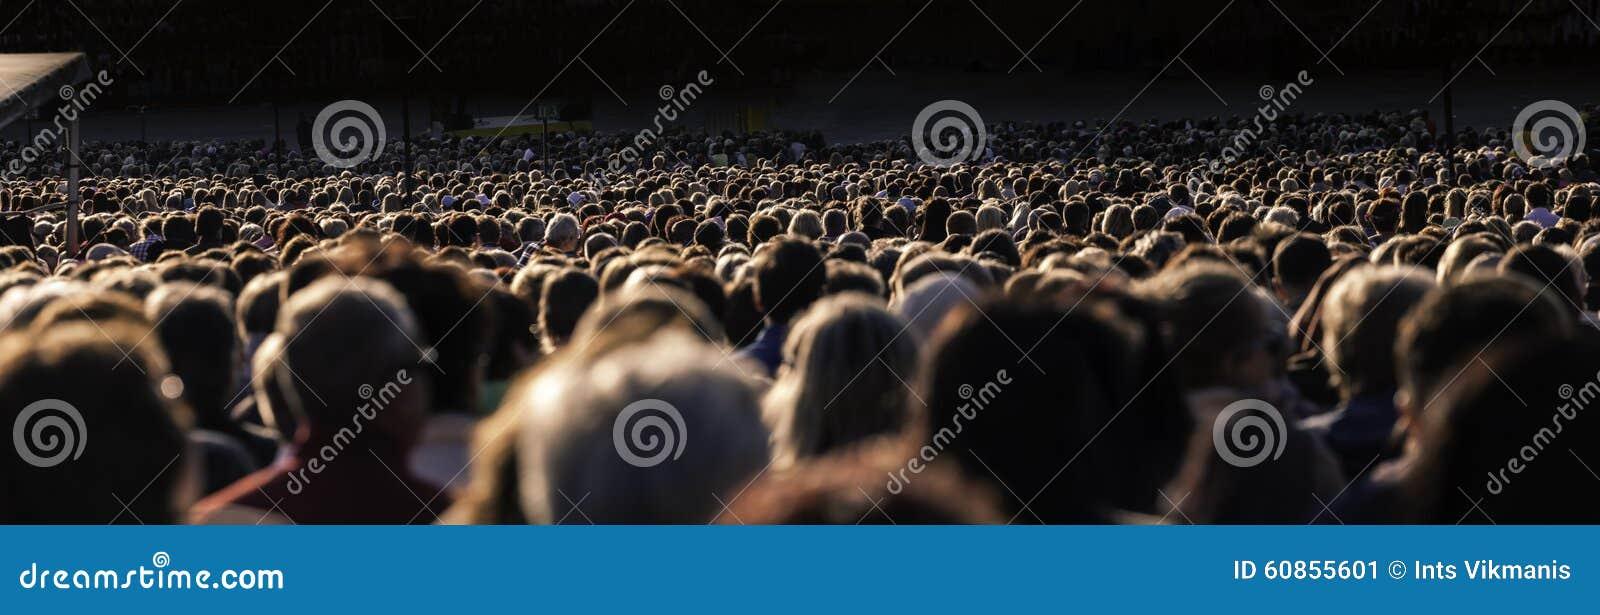 Grote menigte van mensen